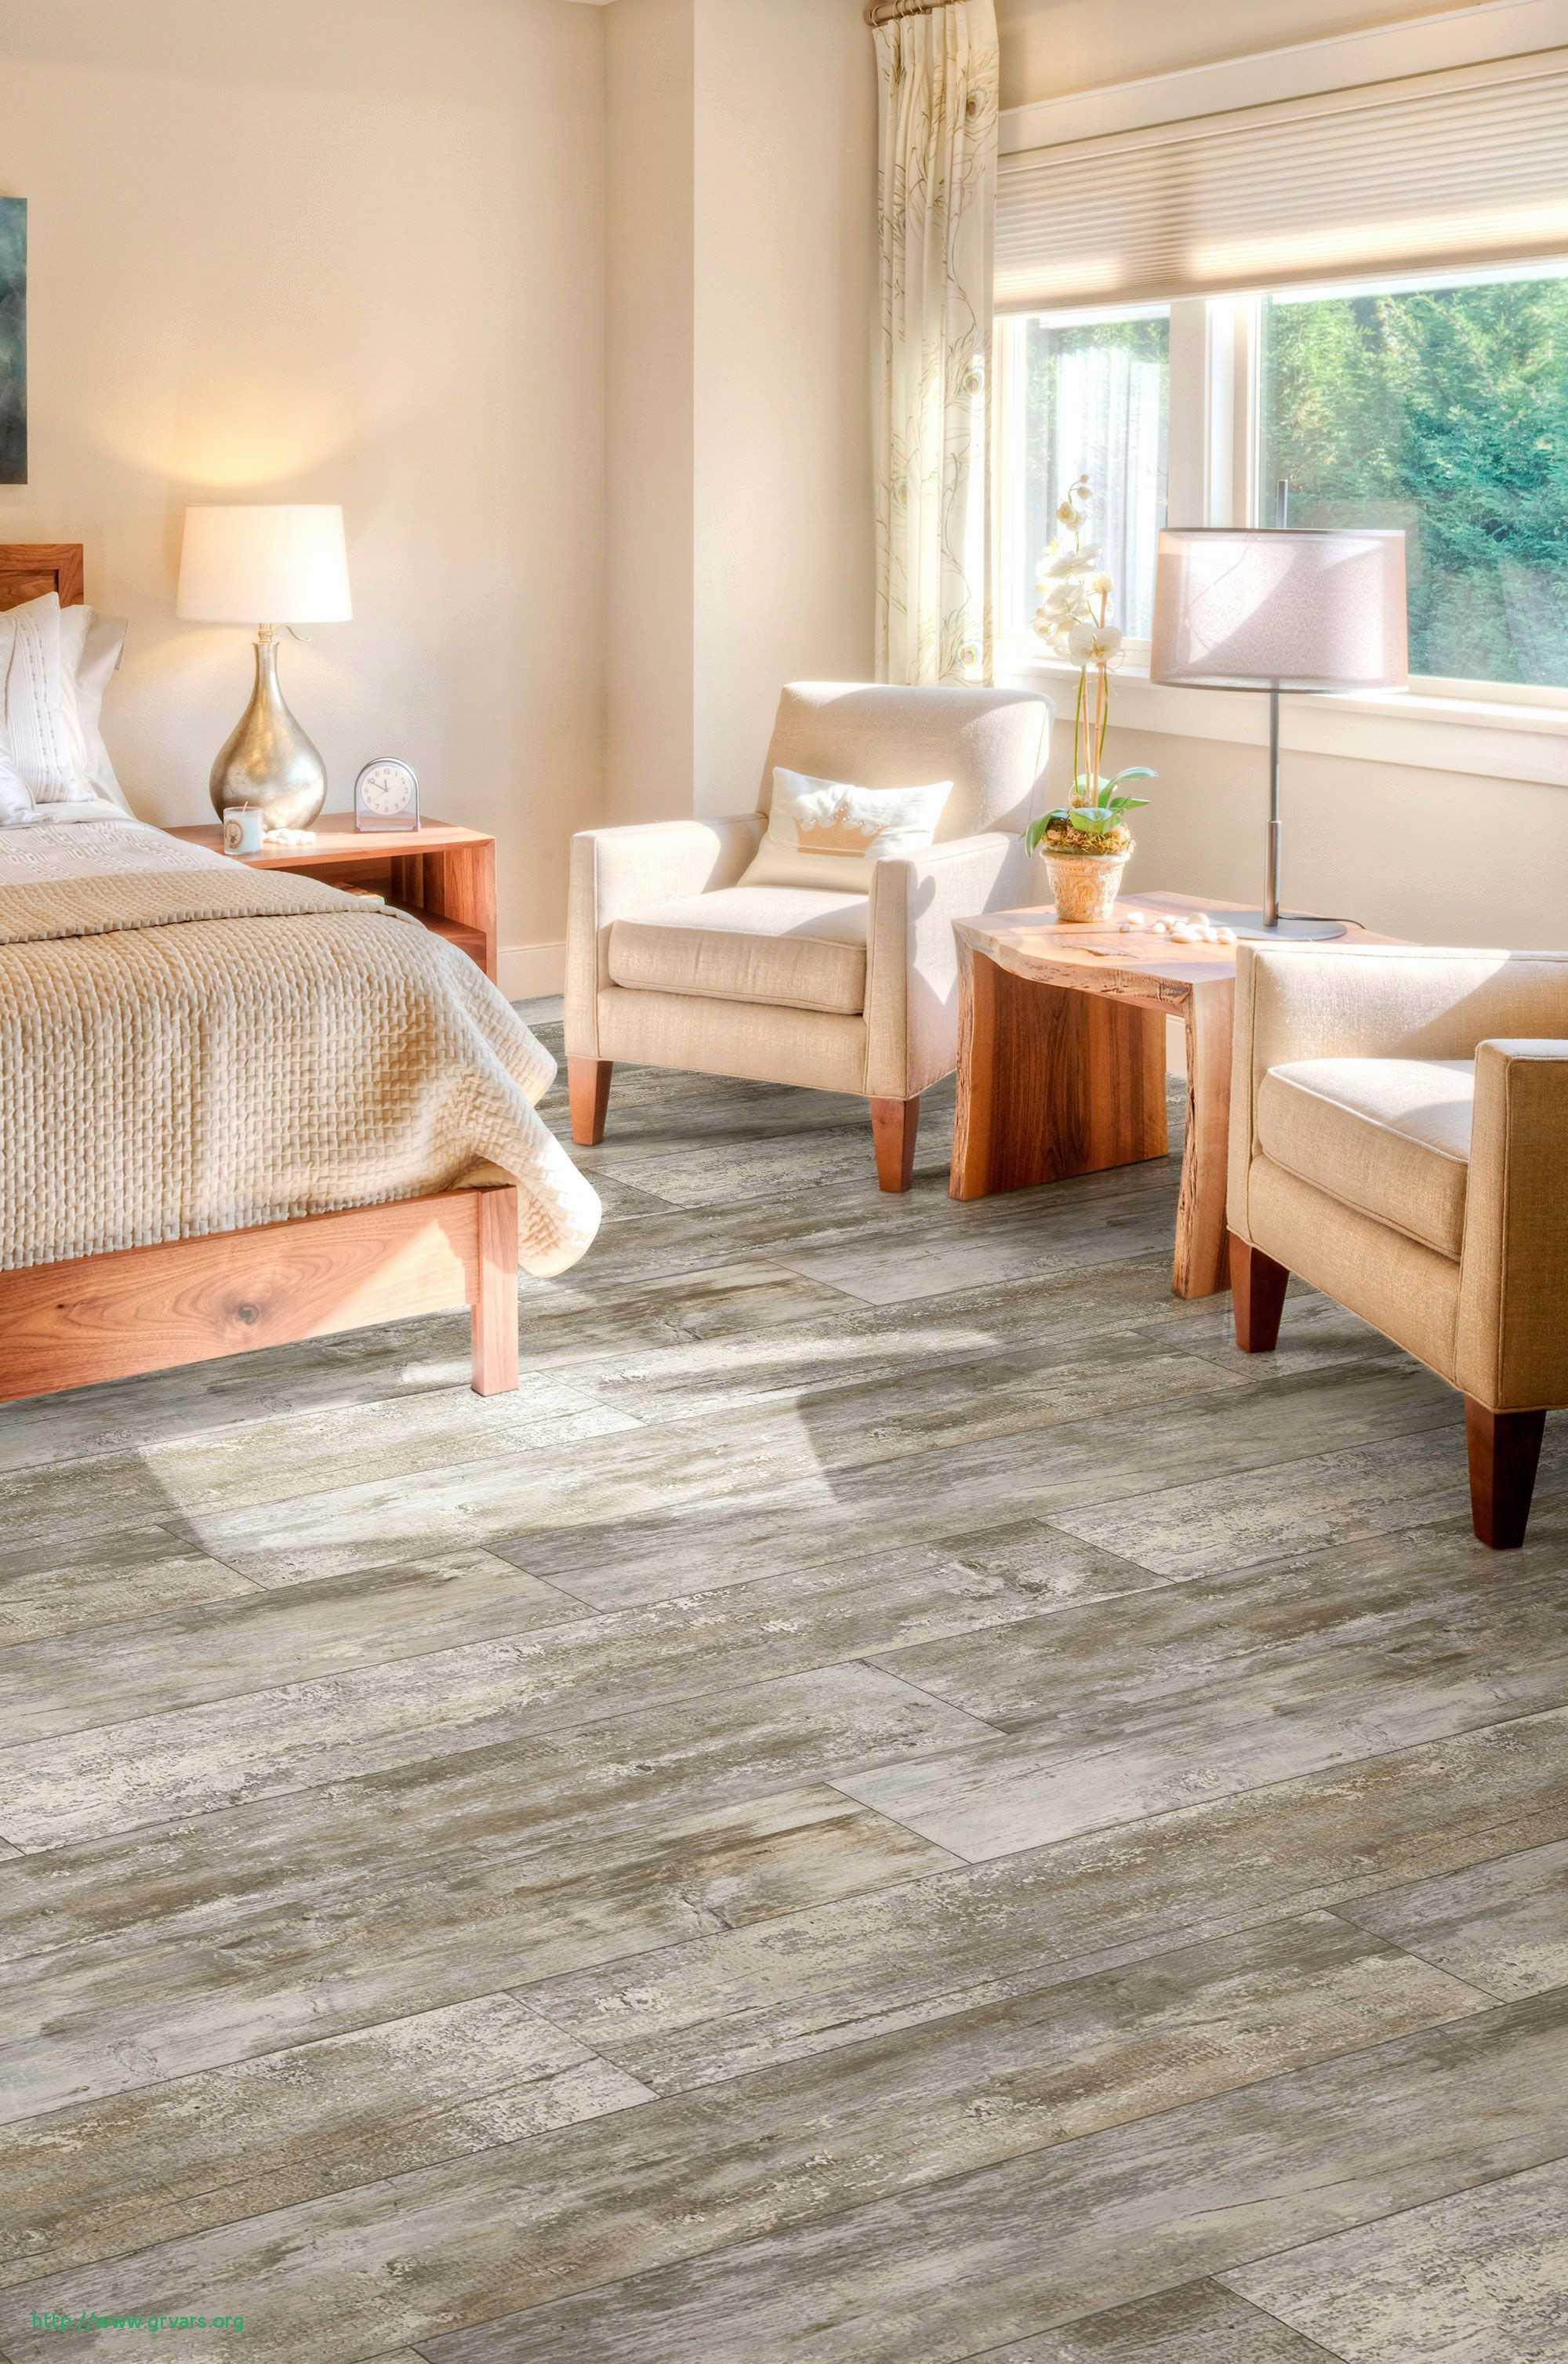 hardwood floor alternatives of 23 frais how much is a hardwood floor ideas blog with hardwood floor wood hardwood floor types unique i pinimg 736x 0d 7b 00 luxury wood